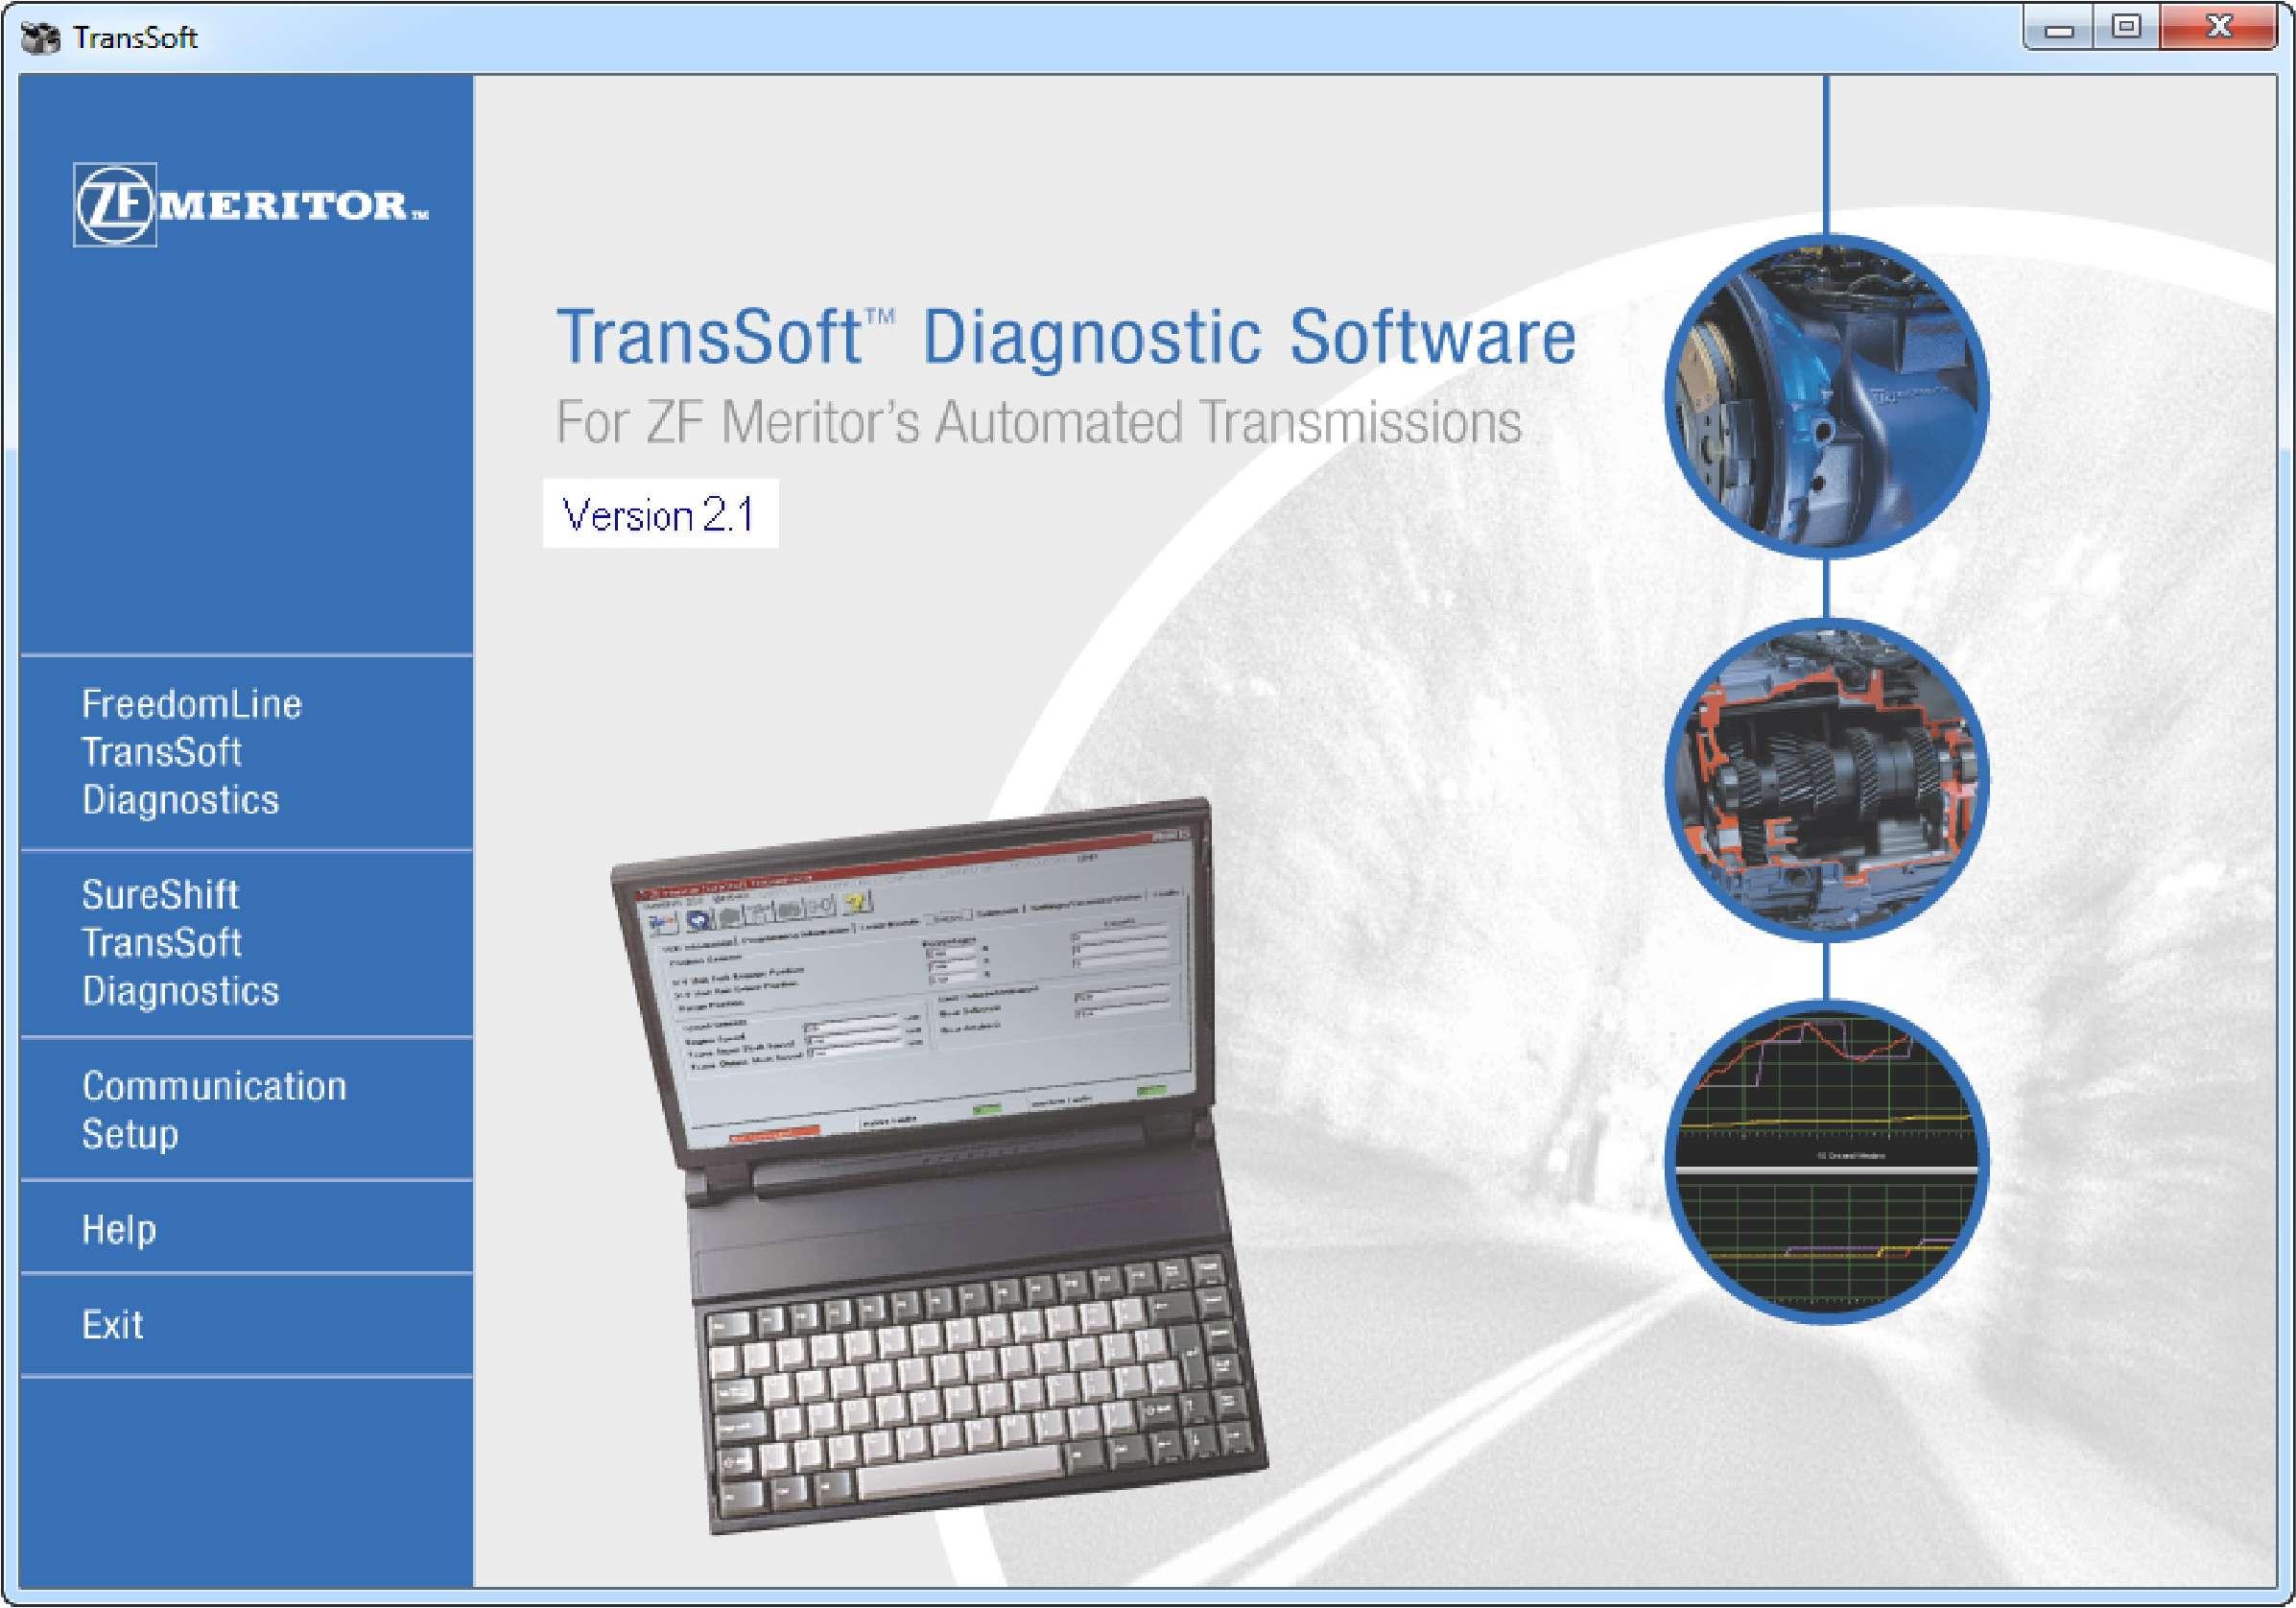 ZF MERITOR TransSoft SS-01